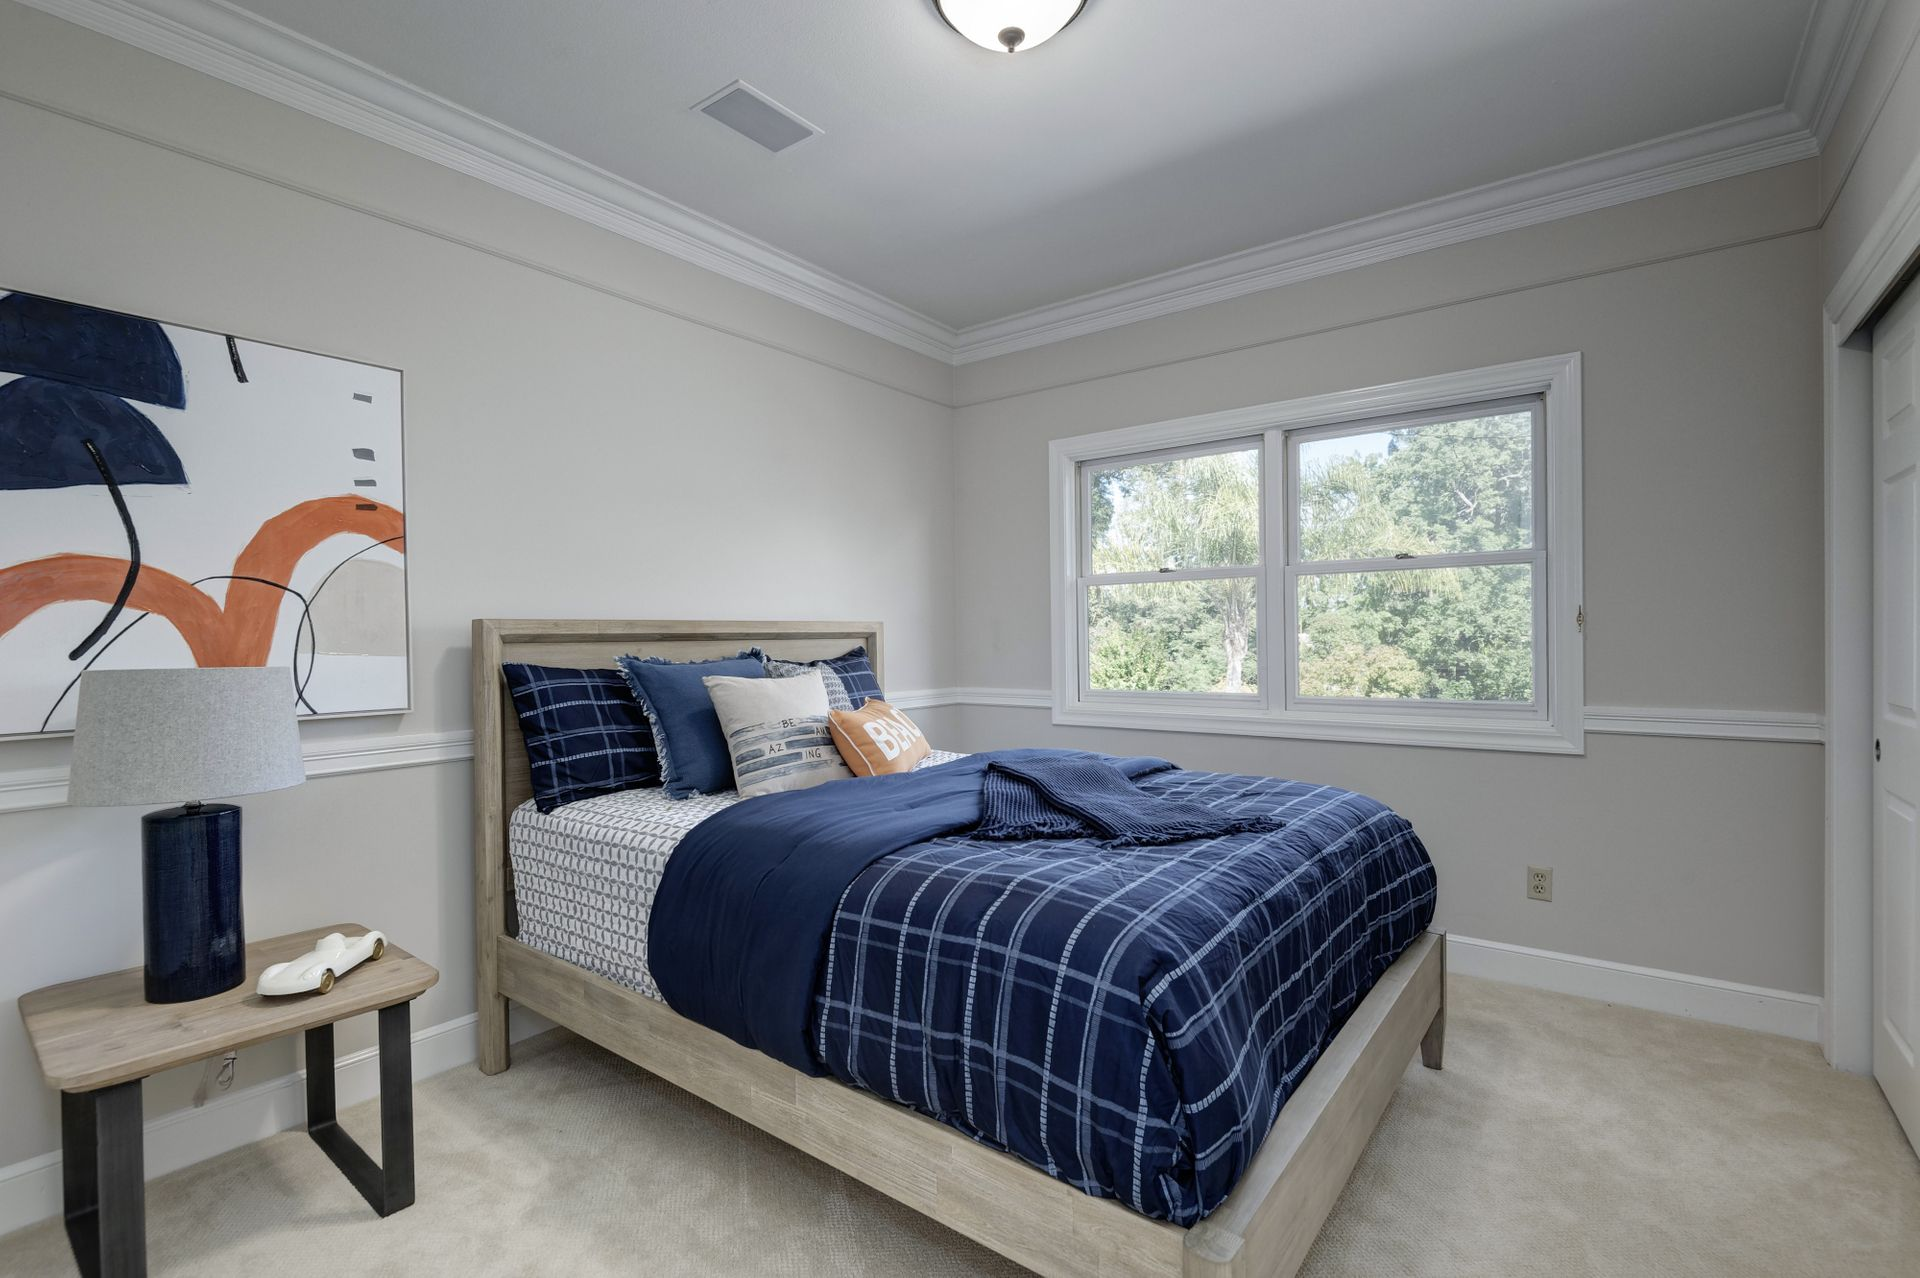 27_Bedroom.jpg